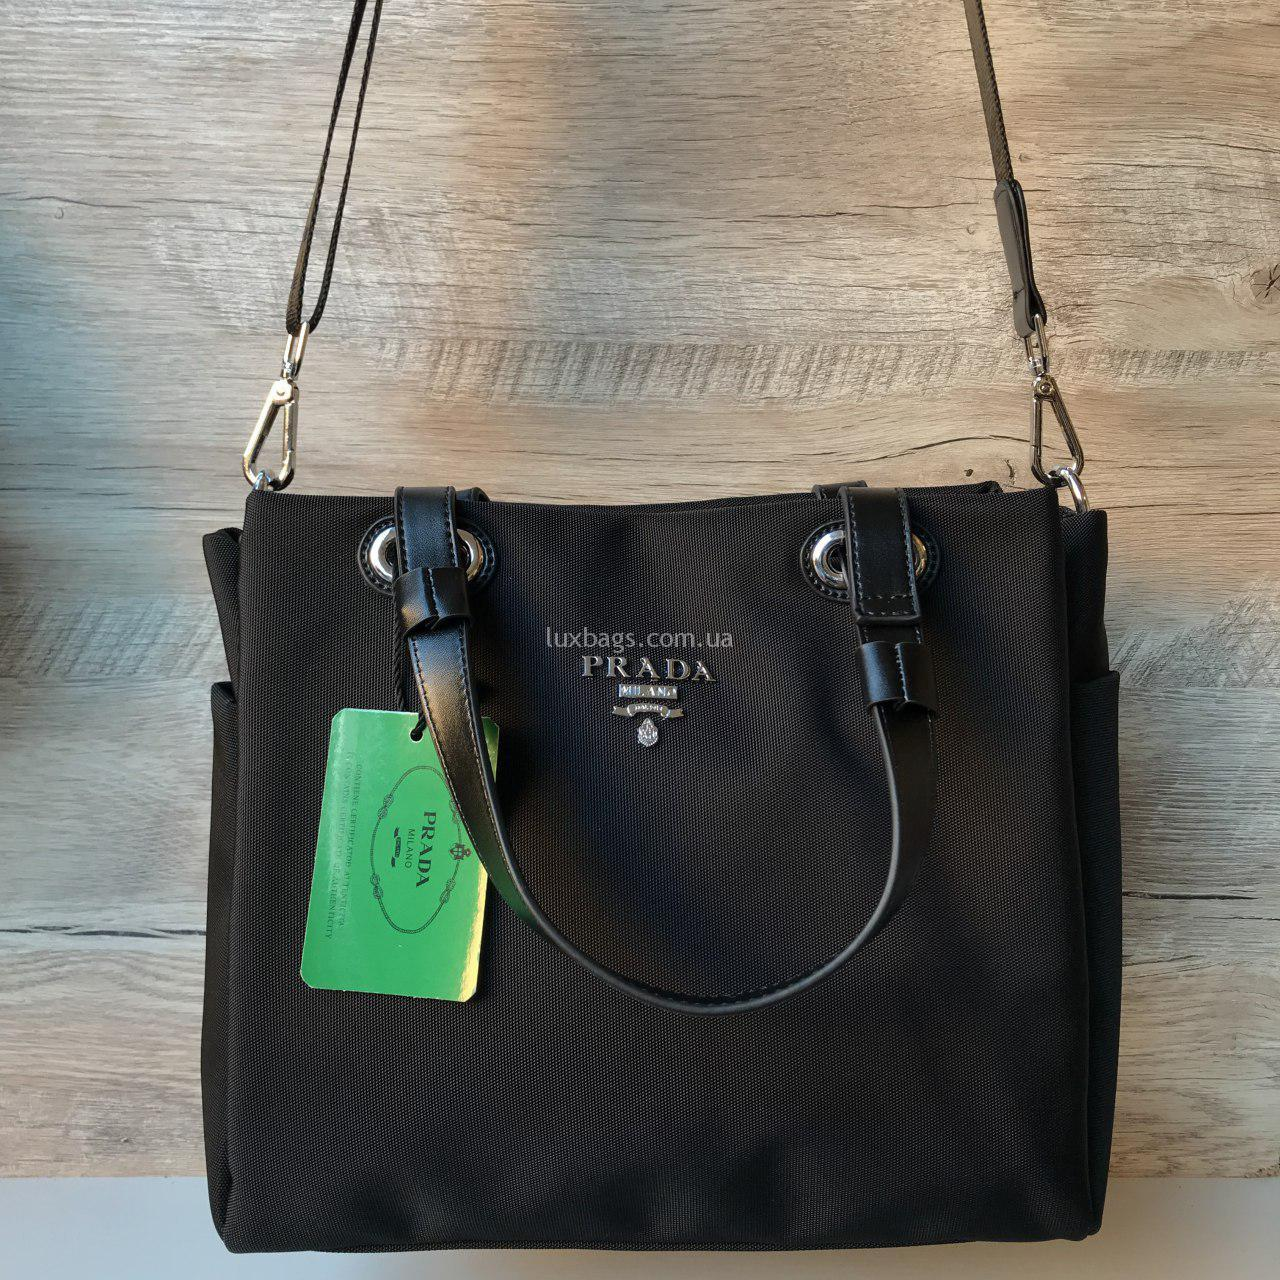 eb4da0ed0a0f Женская сумка Prada прада Купить на lux-bags